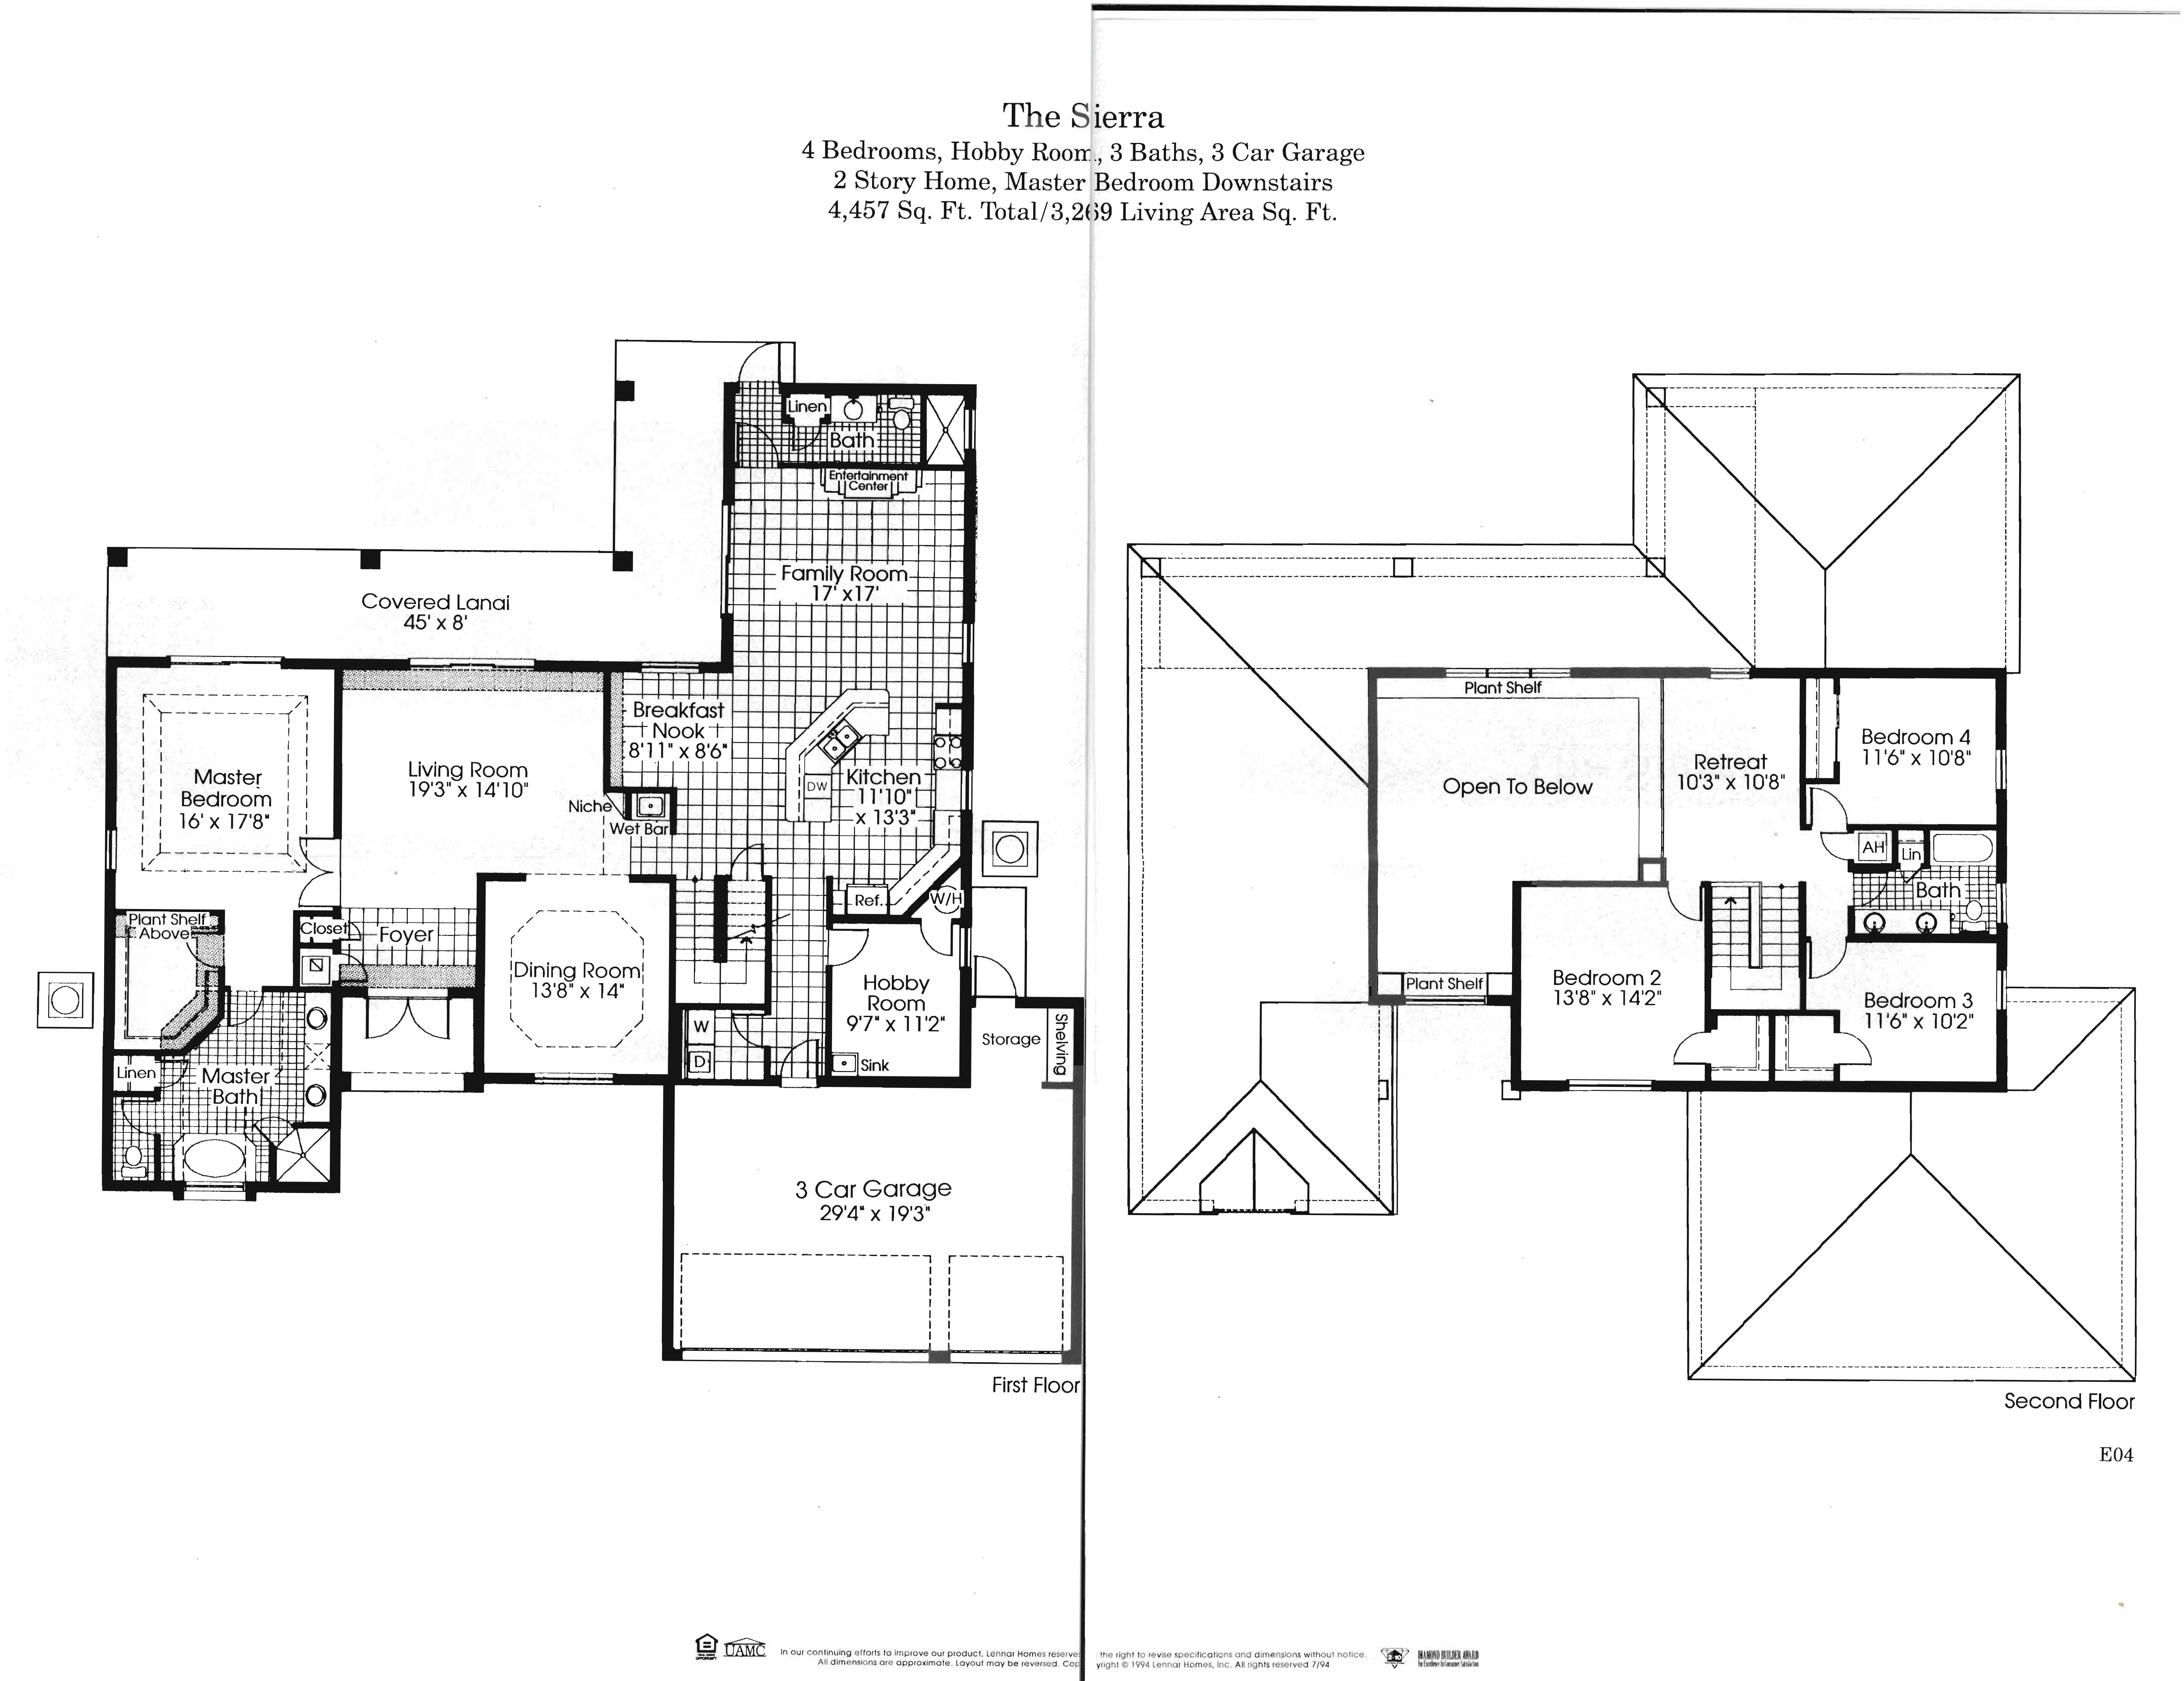 carlton ranches floor plans and community profile carlton